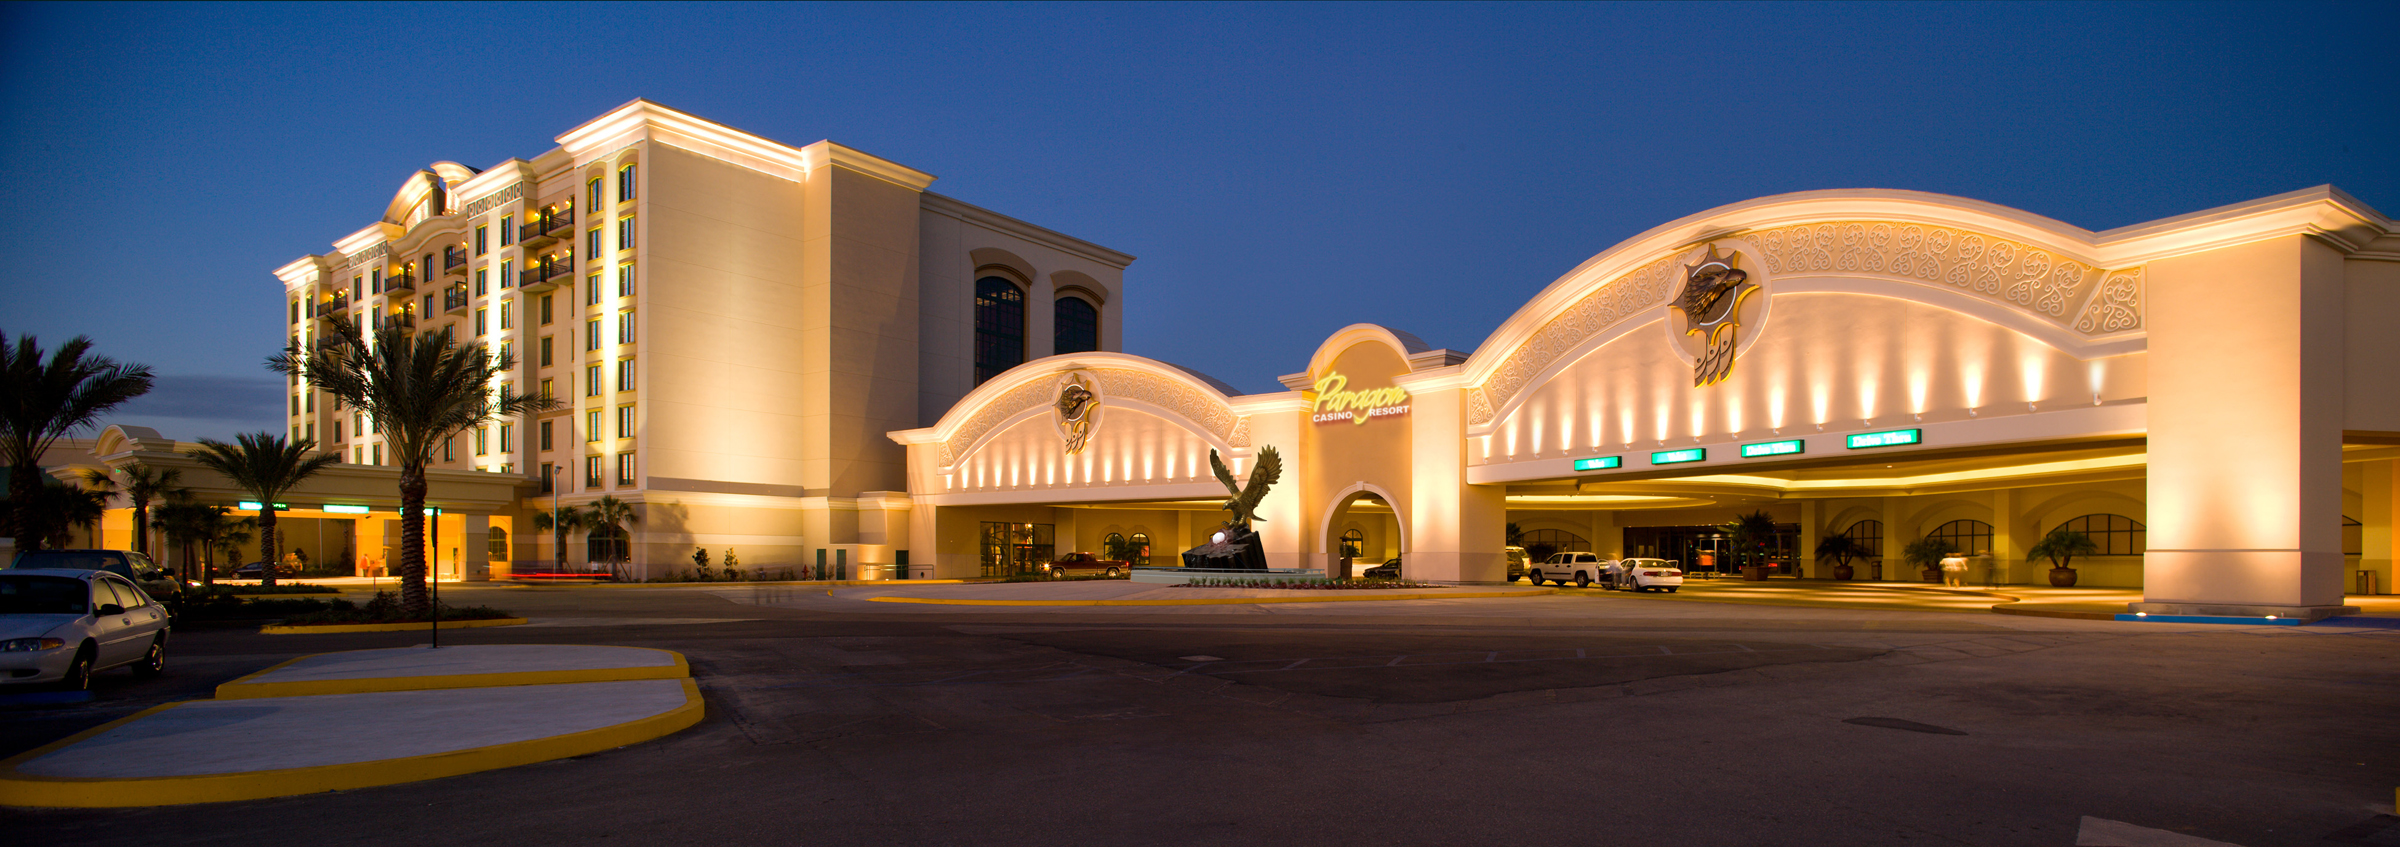 Paragon casino entertainment